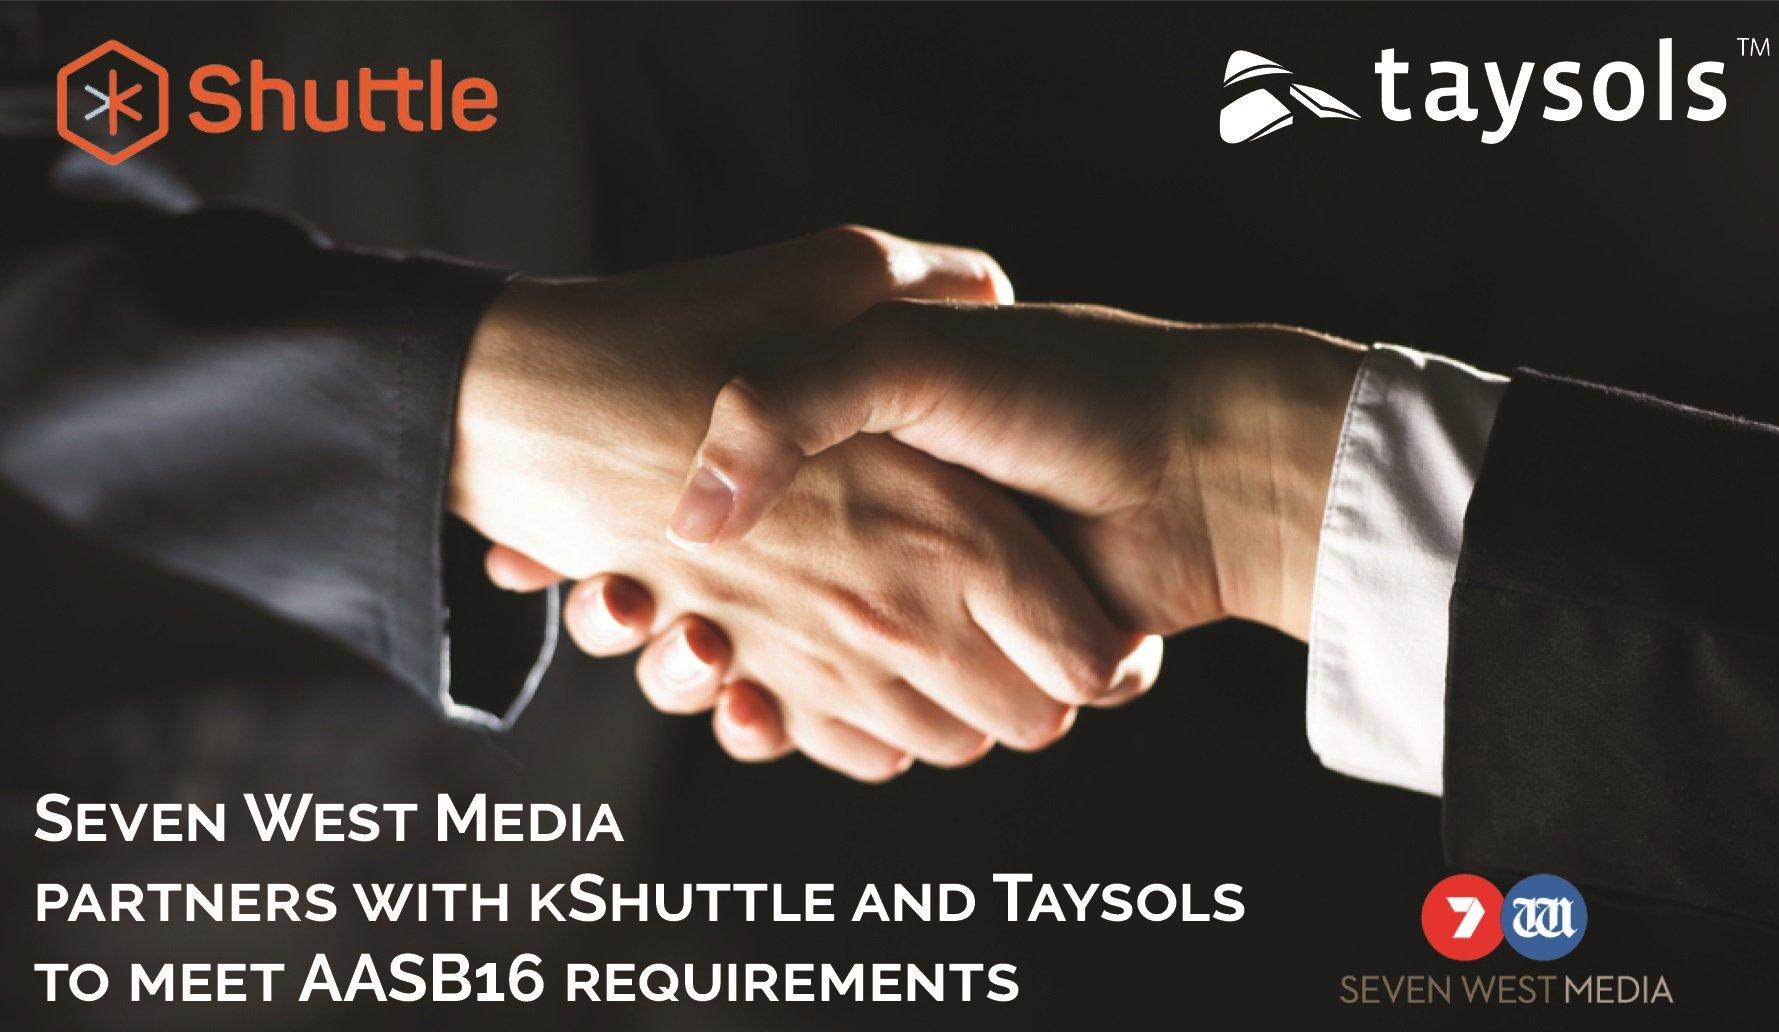 Taysols_press release_SWS_kshuttle_Hubspot